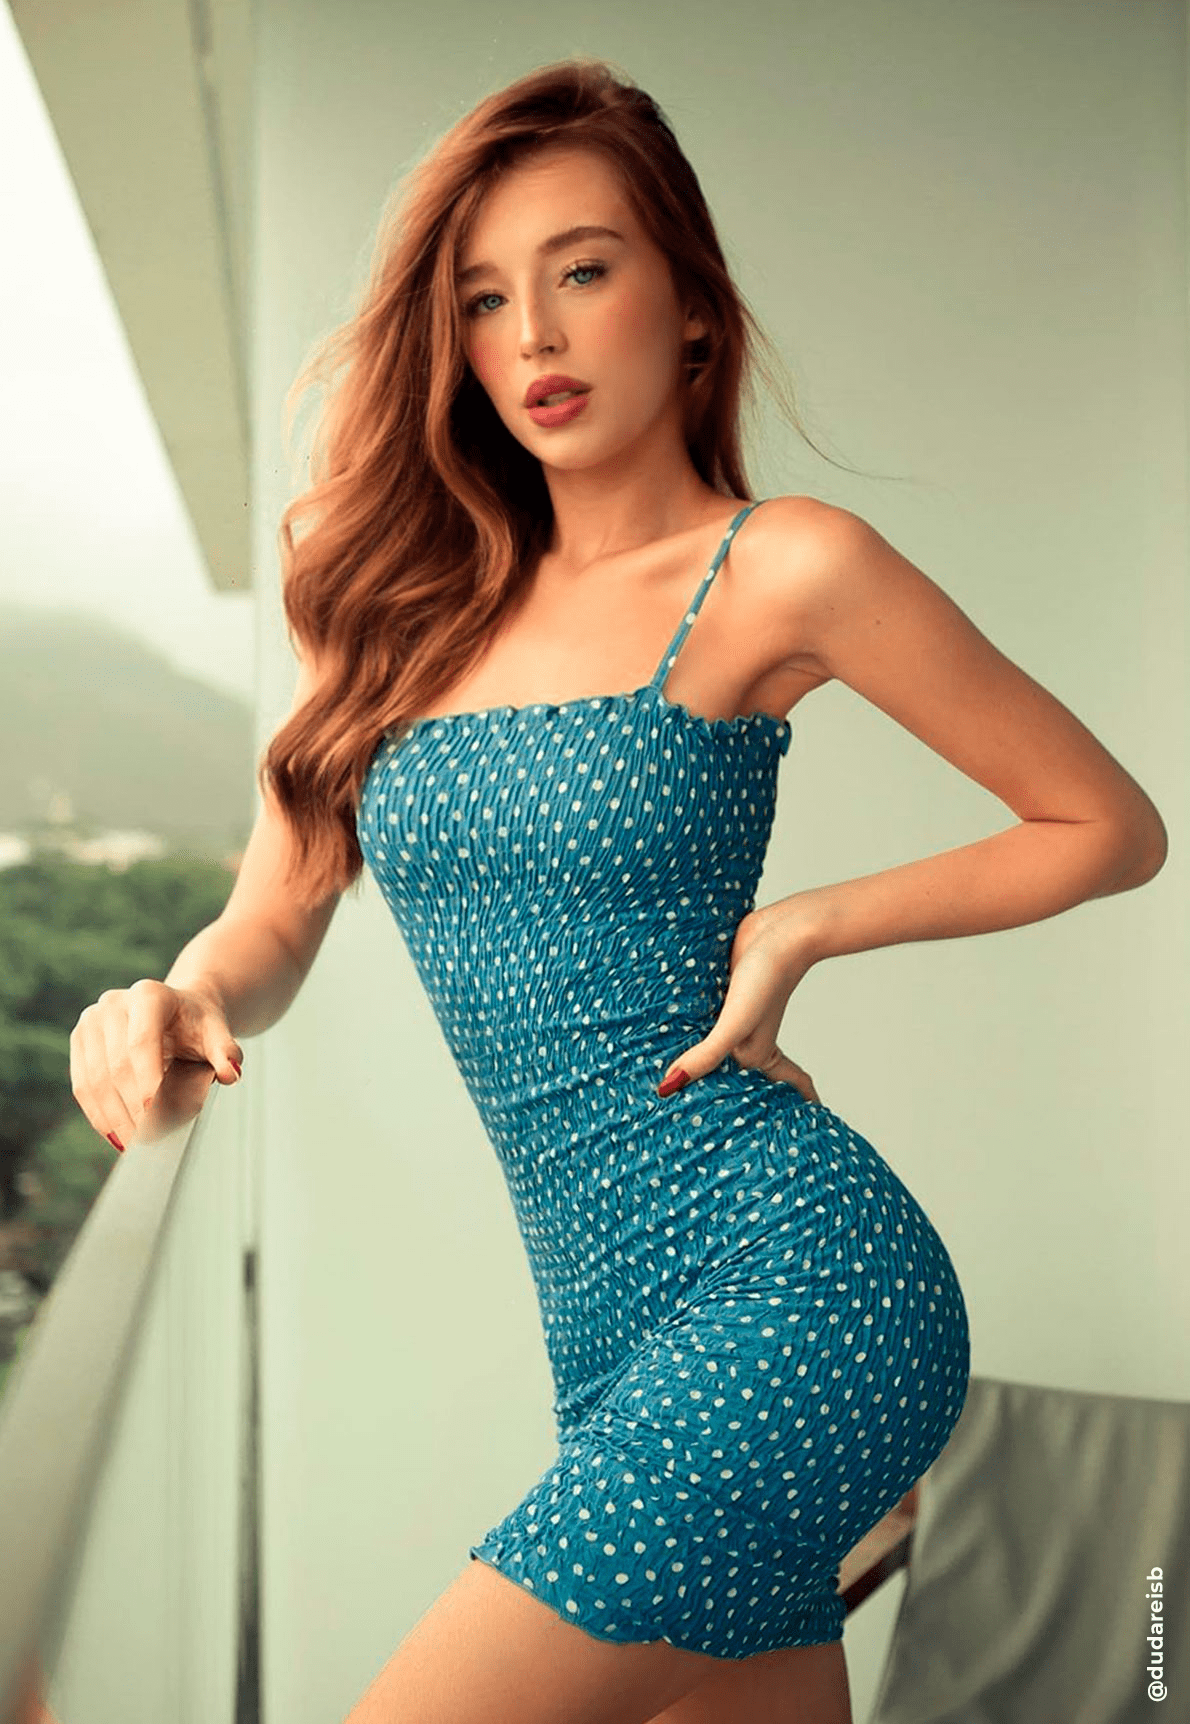 27991-vestido-bolinha-azul-lastex-bruna-mundo-lolita-05